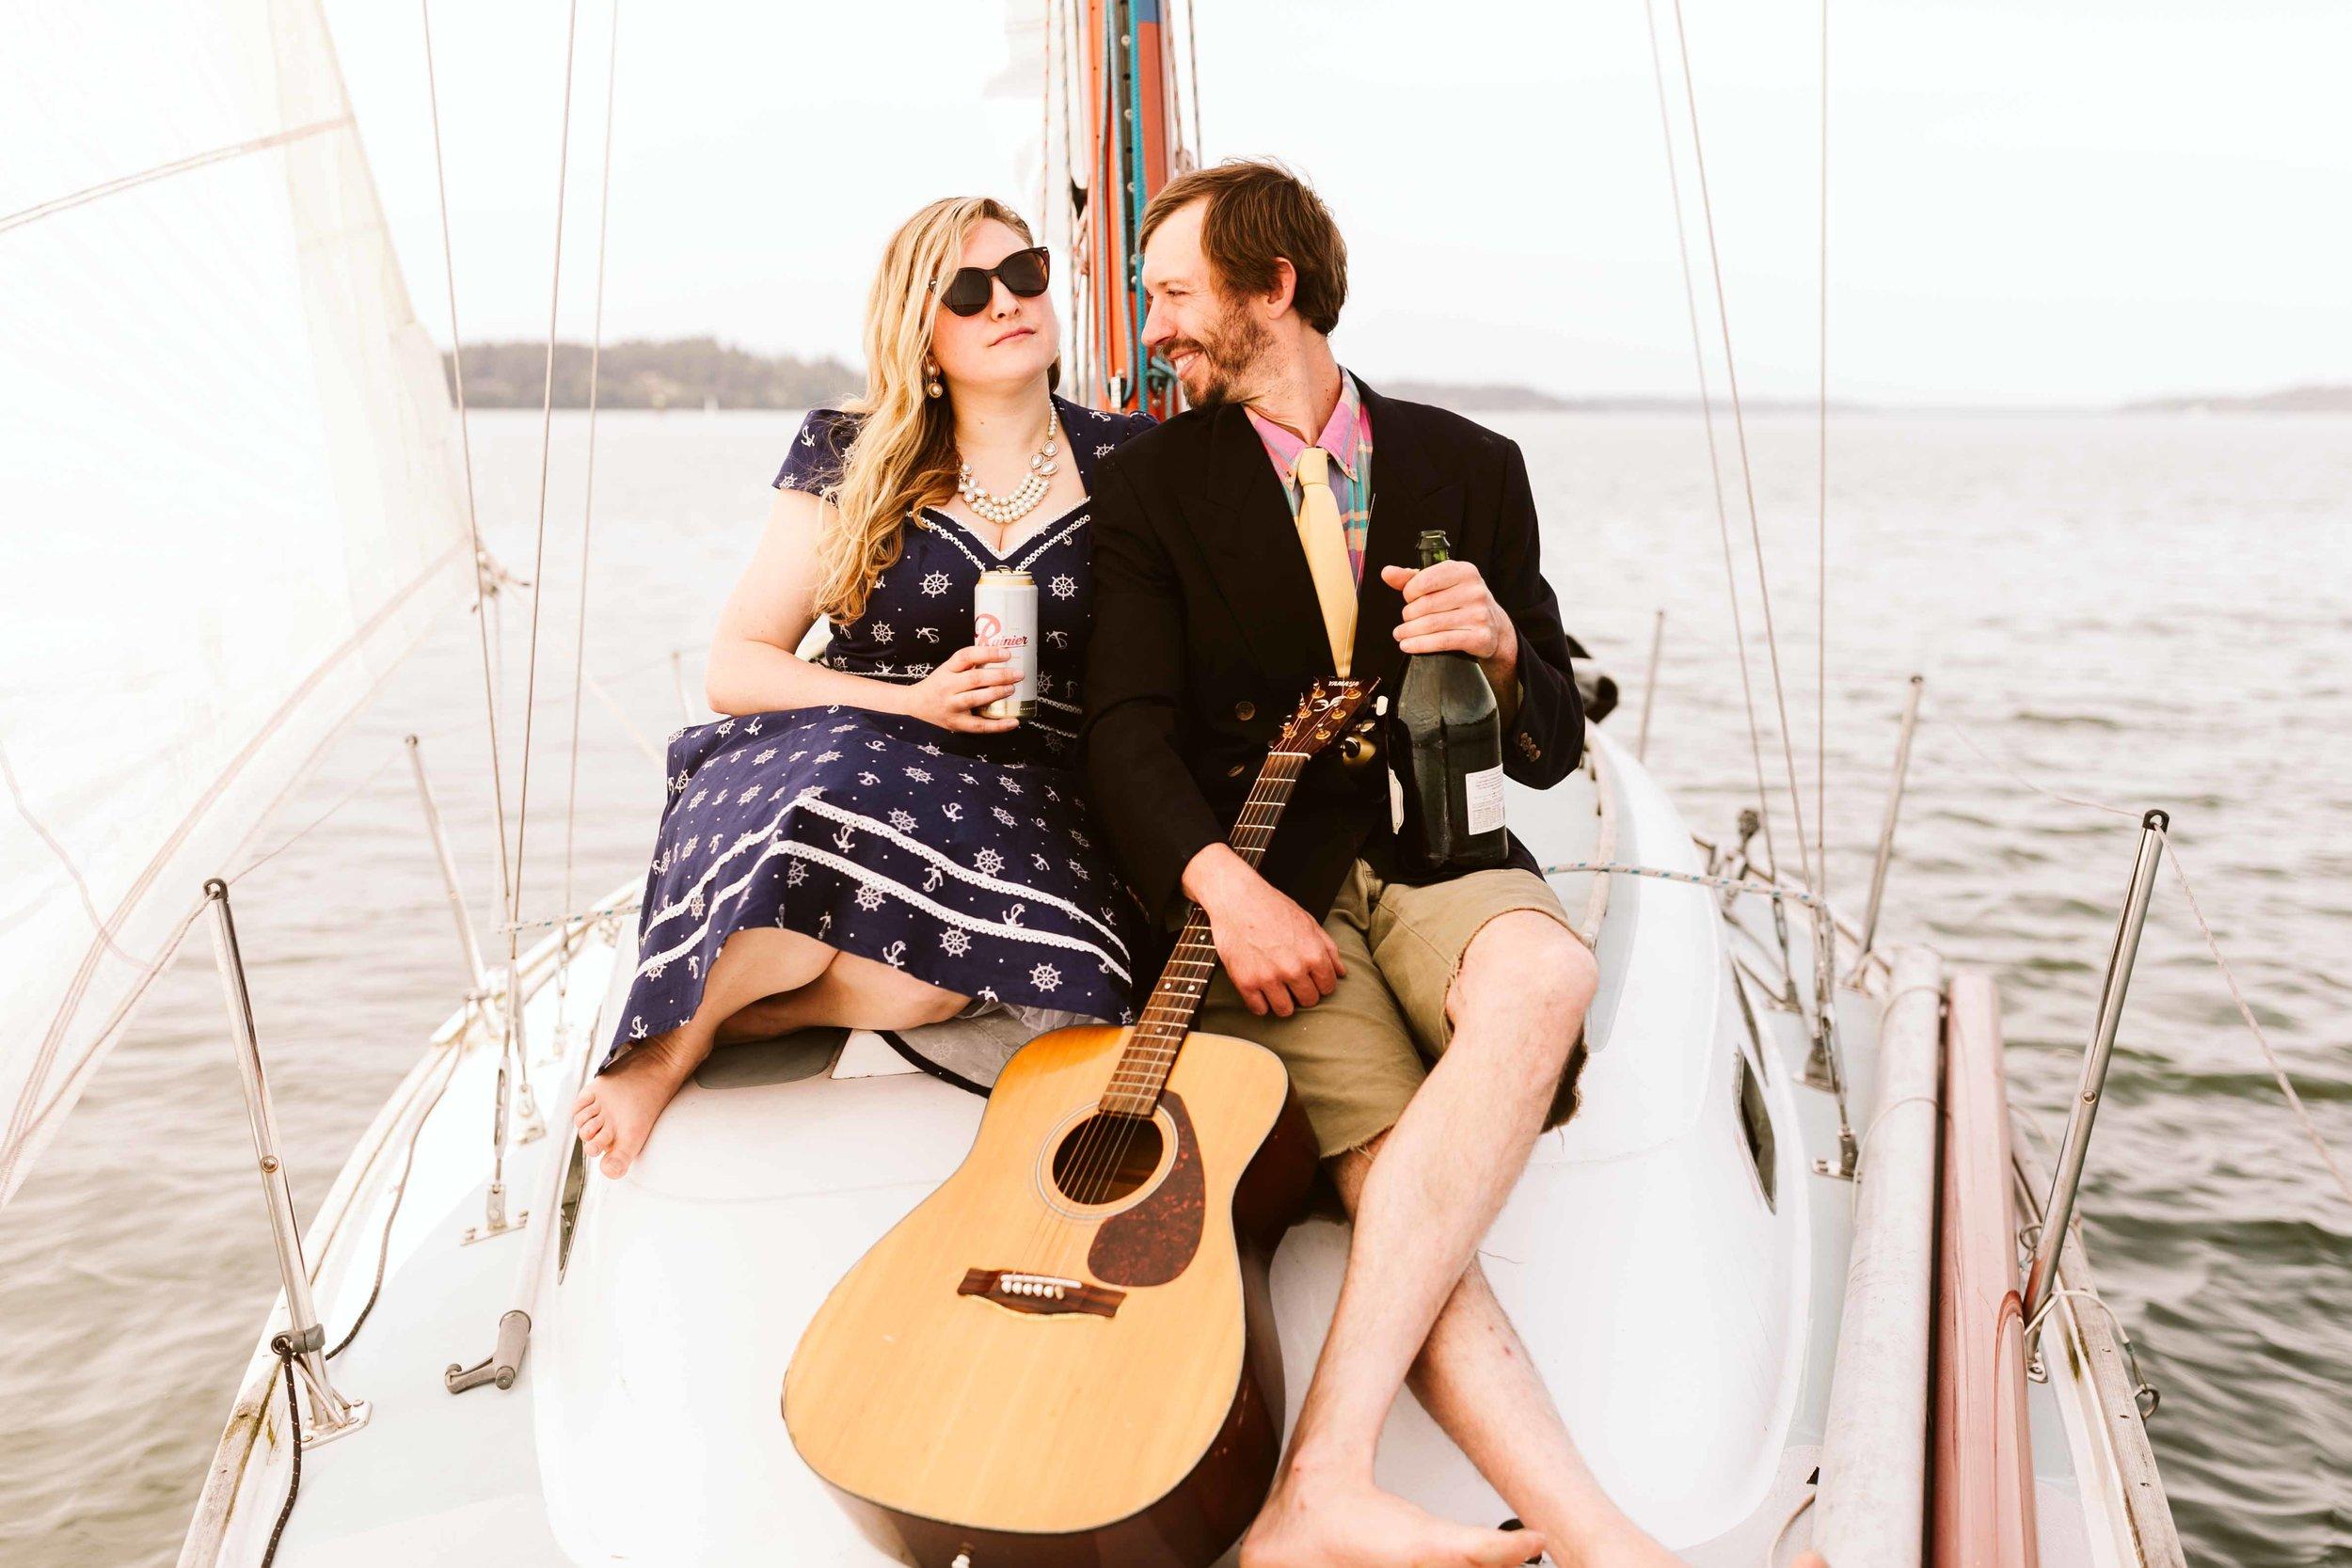 sailboat-engagement-photos-17.jpg